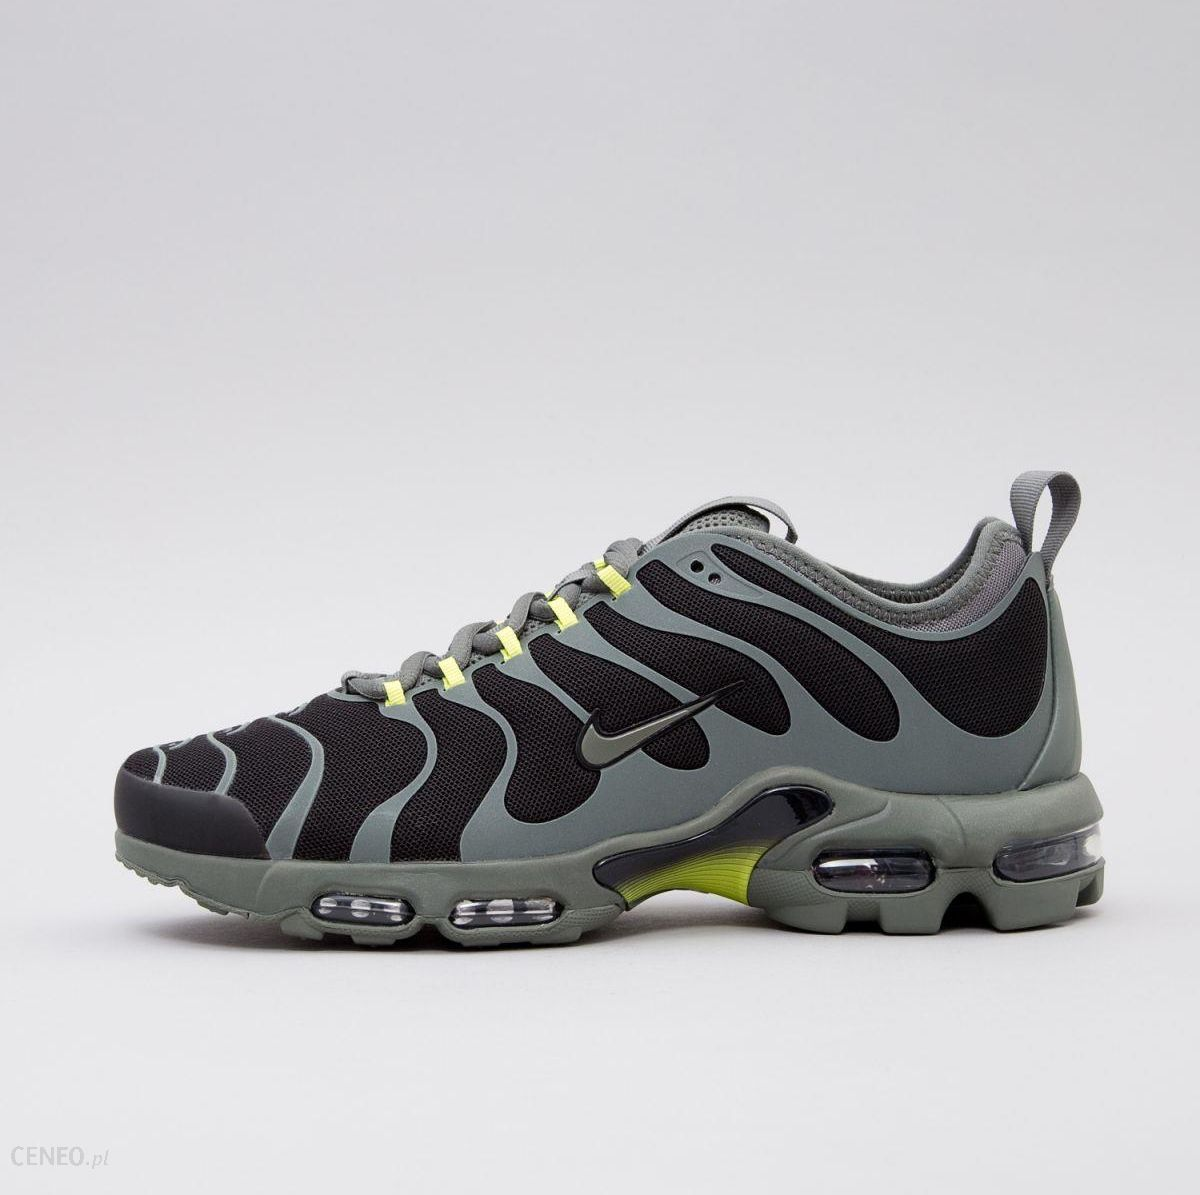 Nike AIR MAX PLUS TN ULTRA 898015 006 Ceny i opinie Ceneo.pl